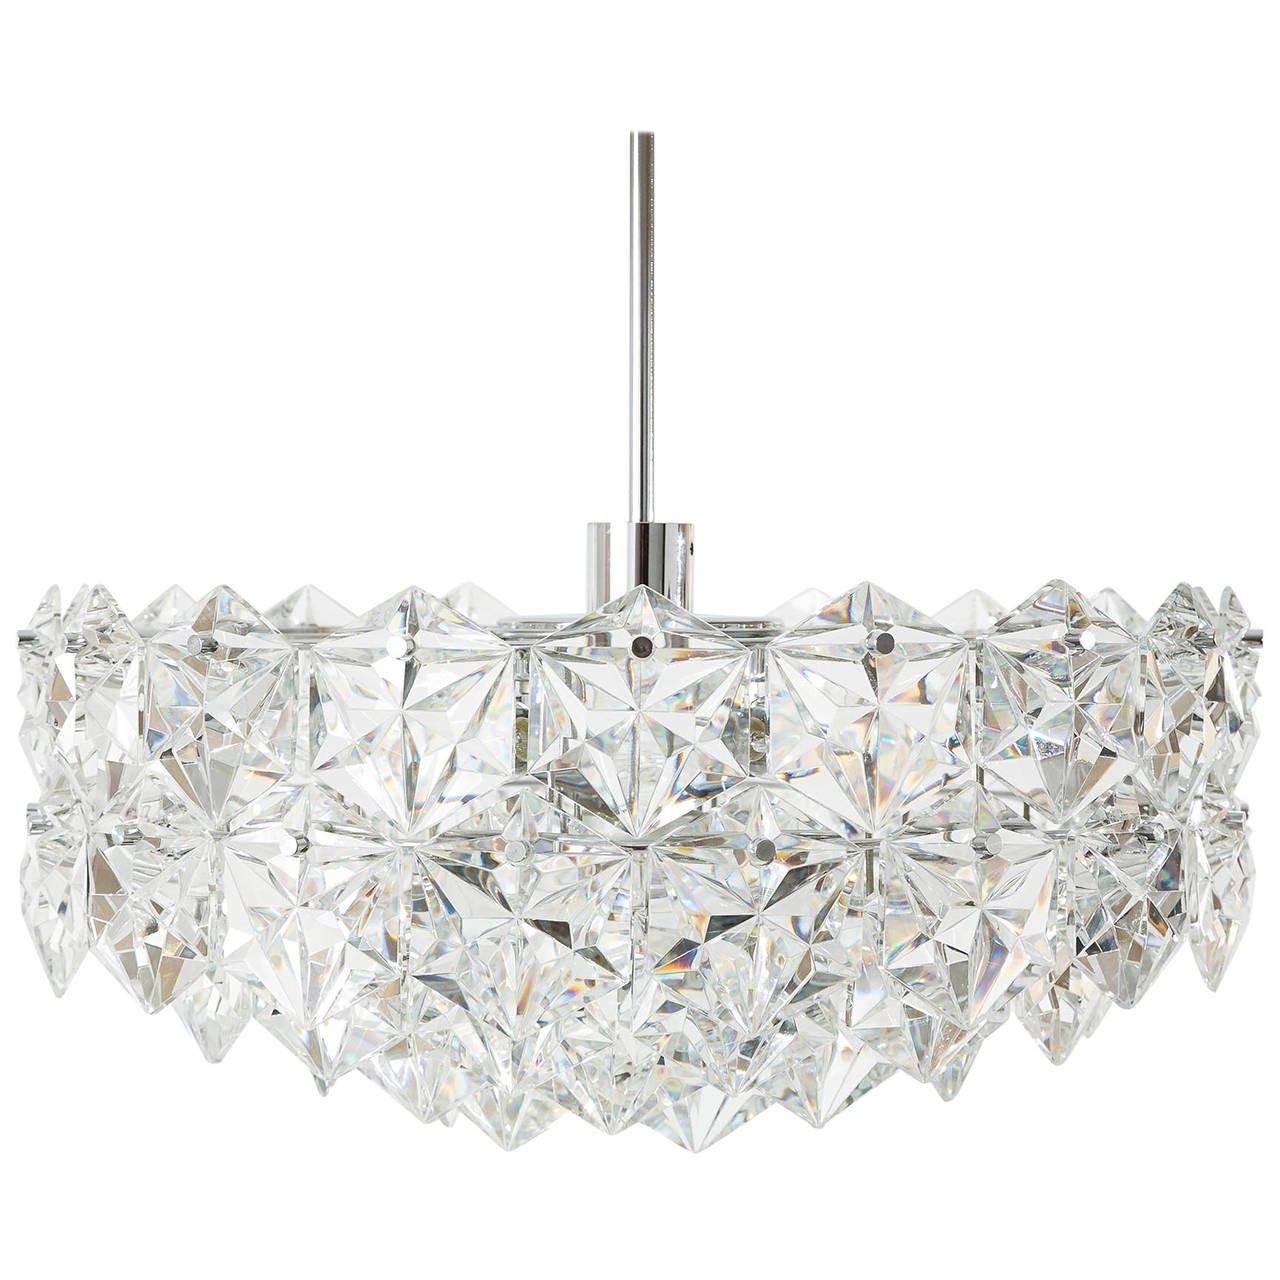 Large Kinkeldey Chandelier Or Flush Mount Light Fixture Crystal Pertaining To Large Glass Chandelier (#11 of 12)